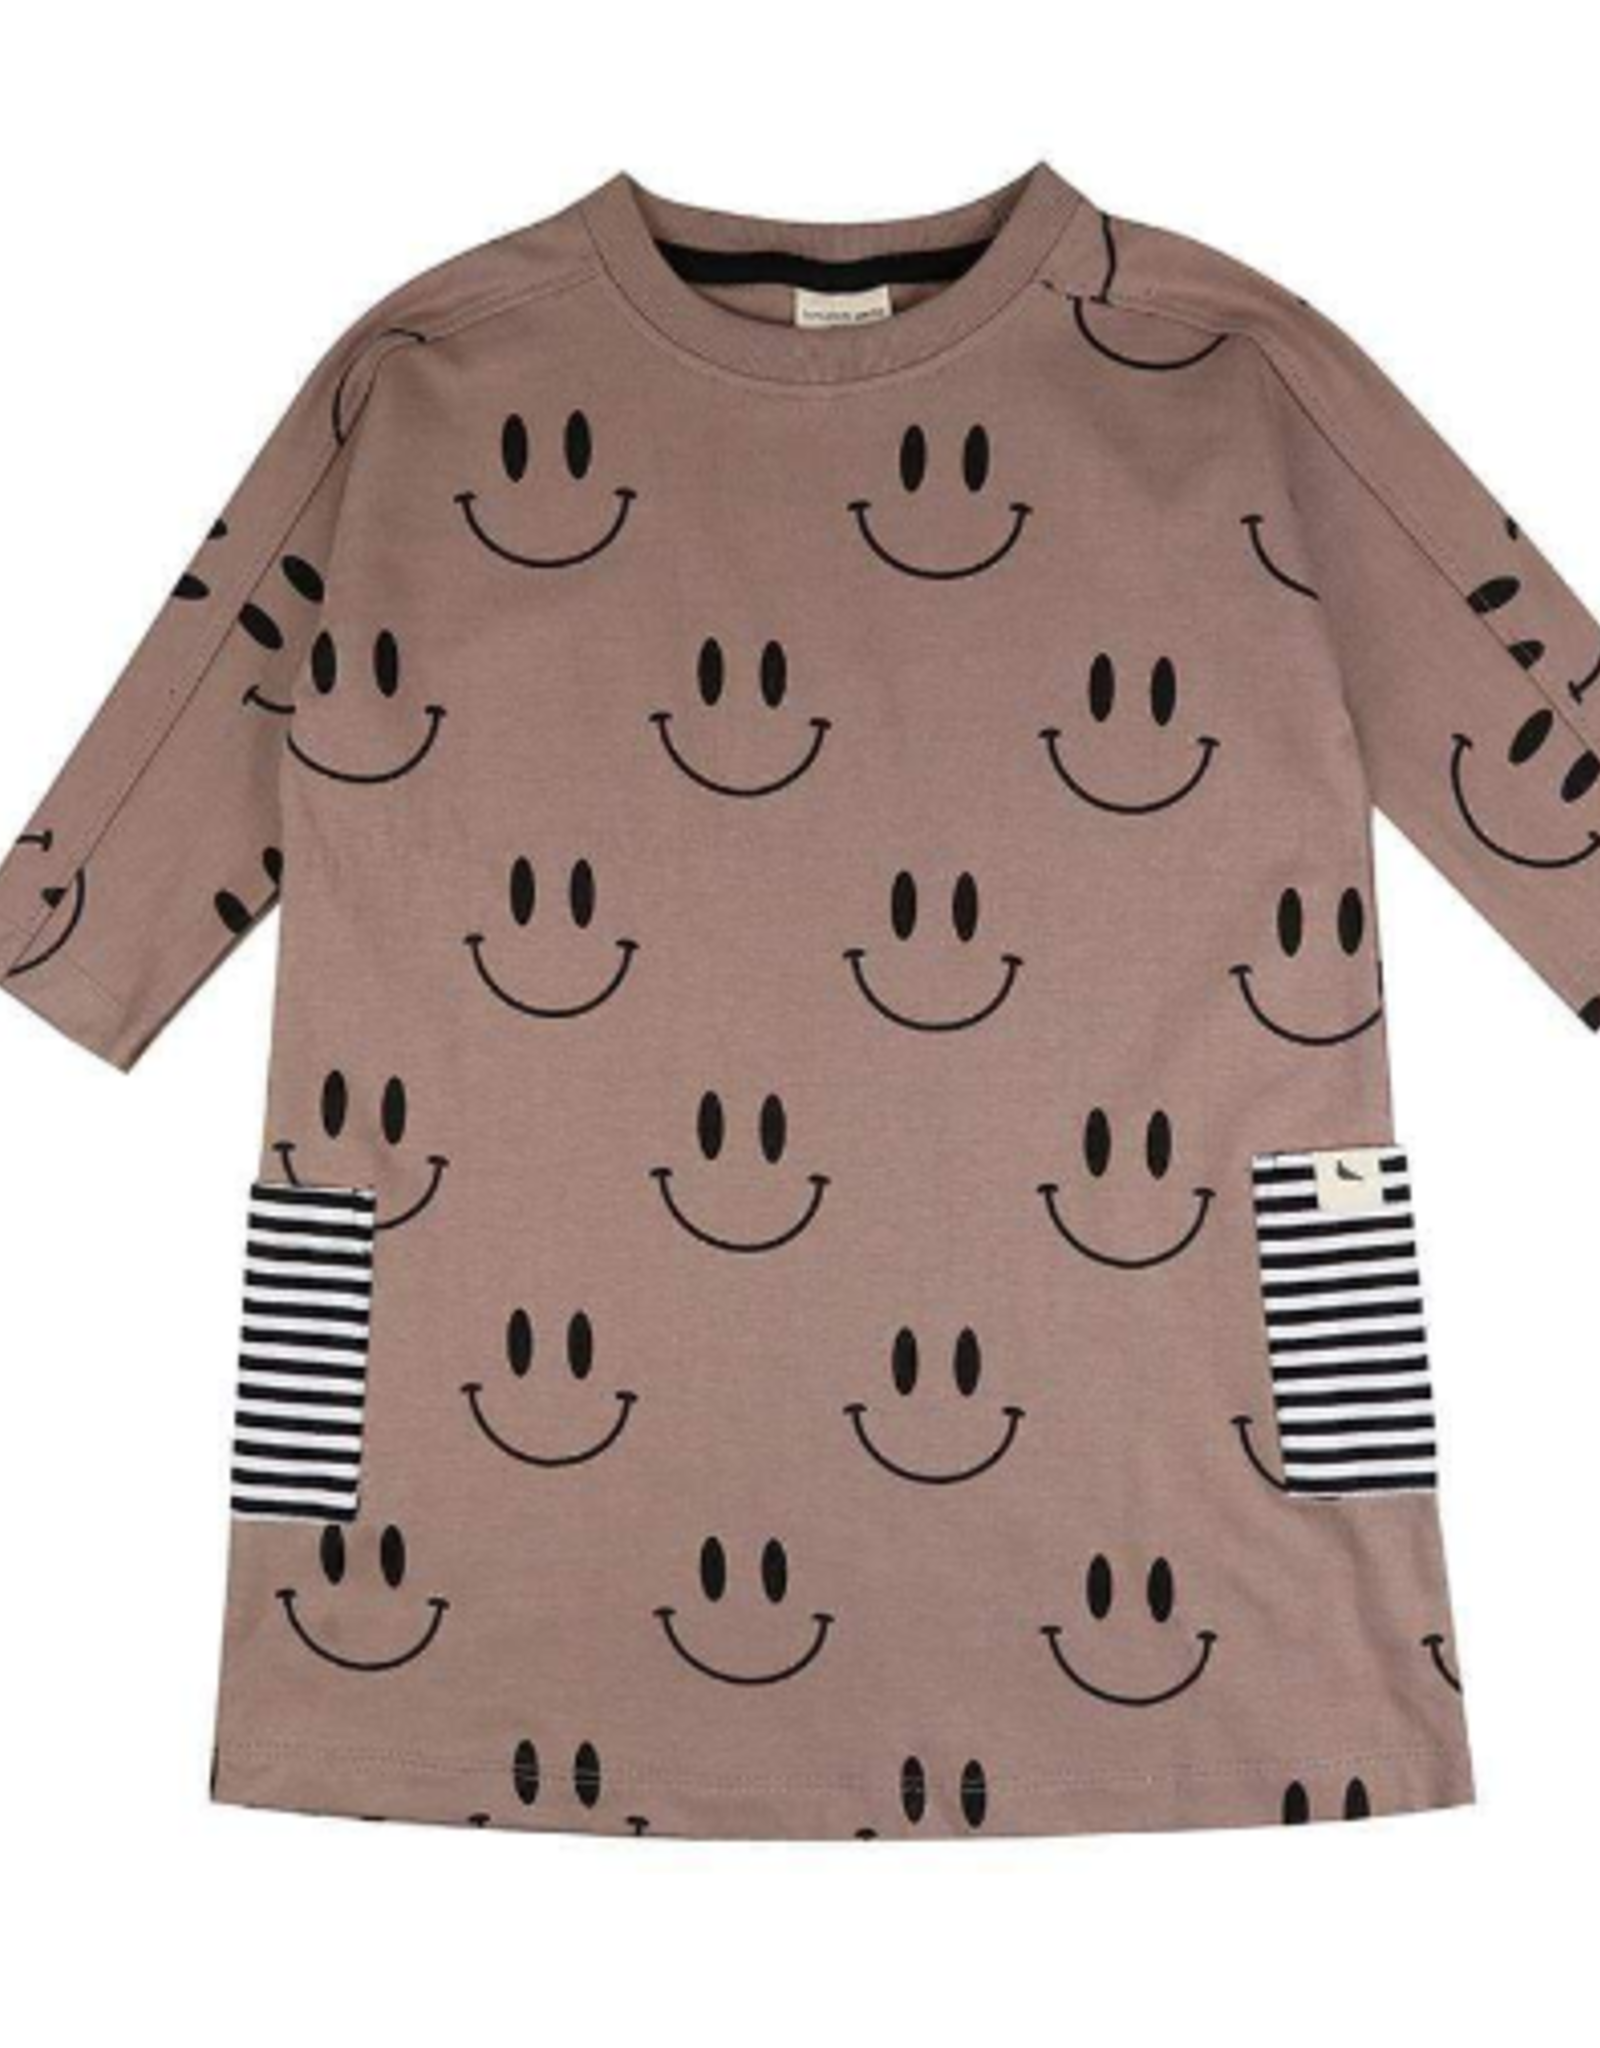 Turtledove London - Lilly + Sid - Smiley Dress